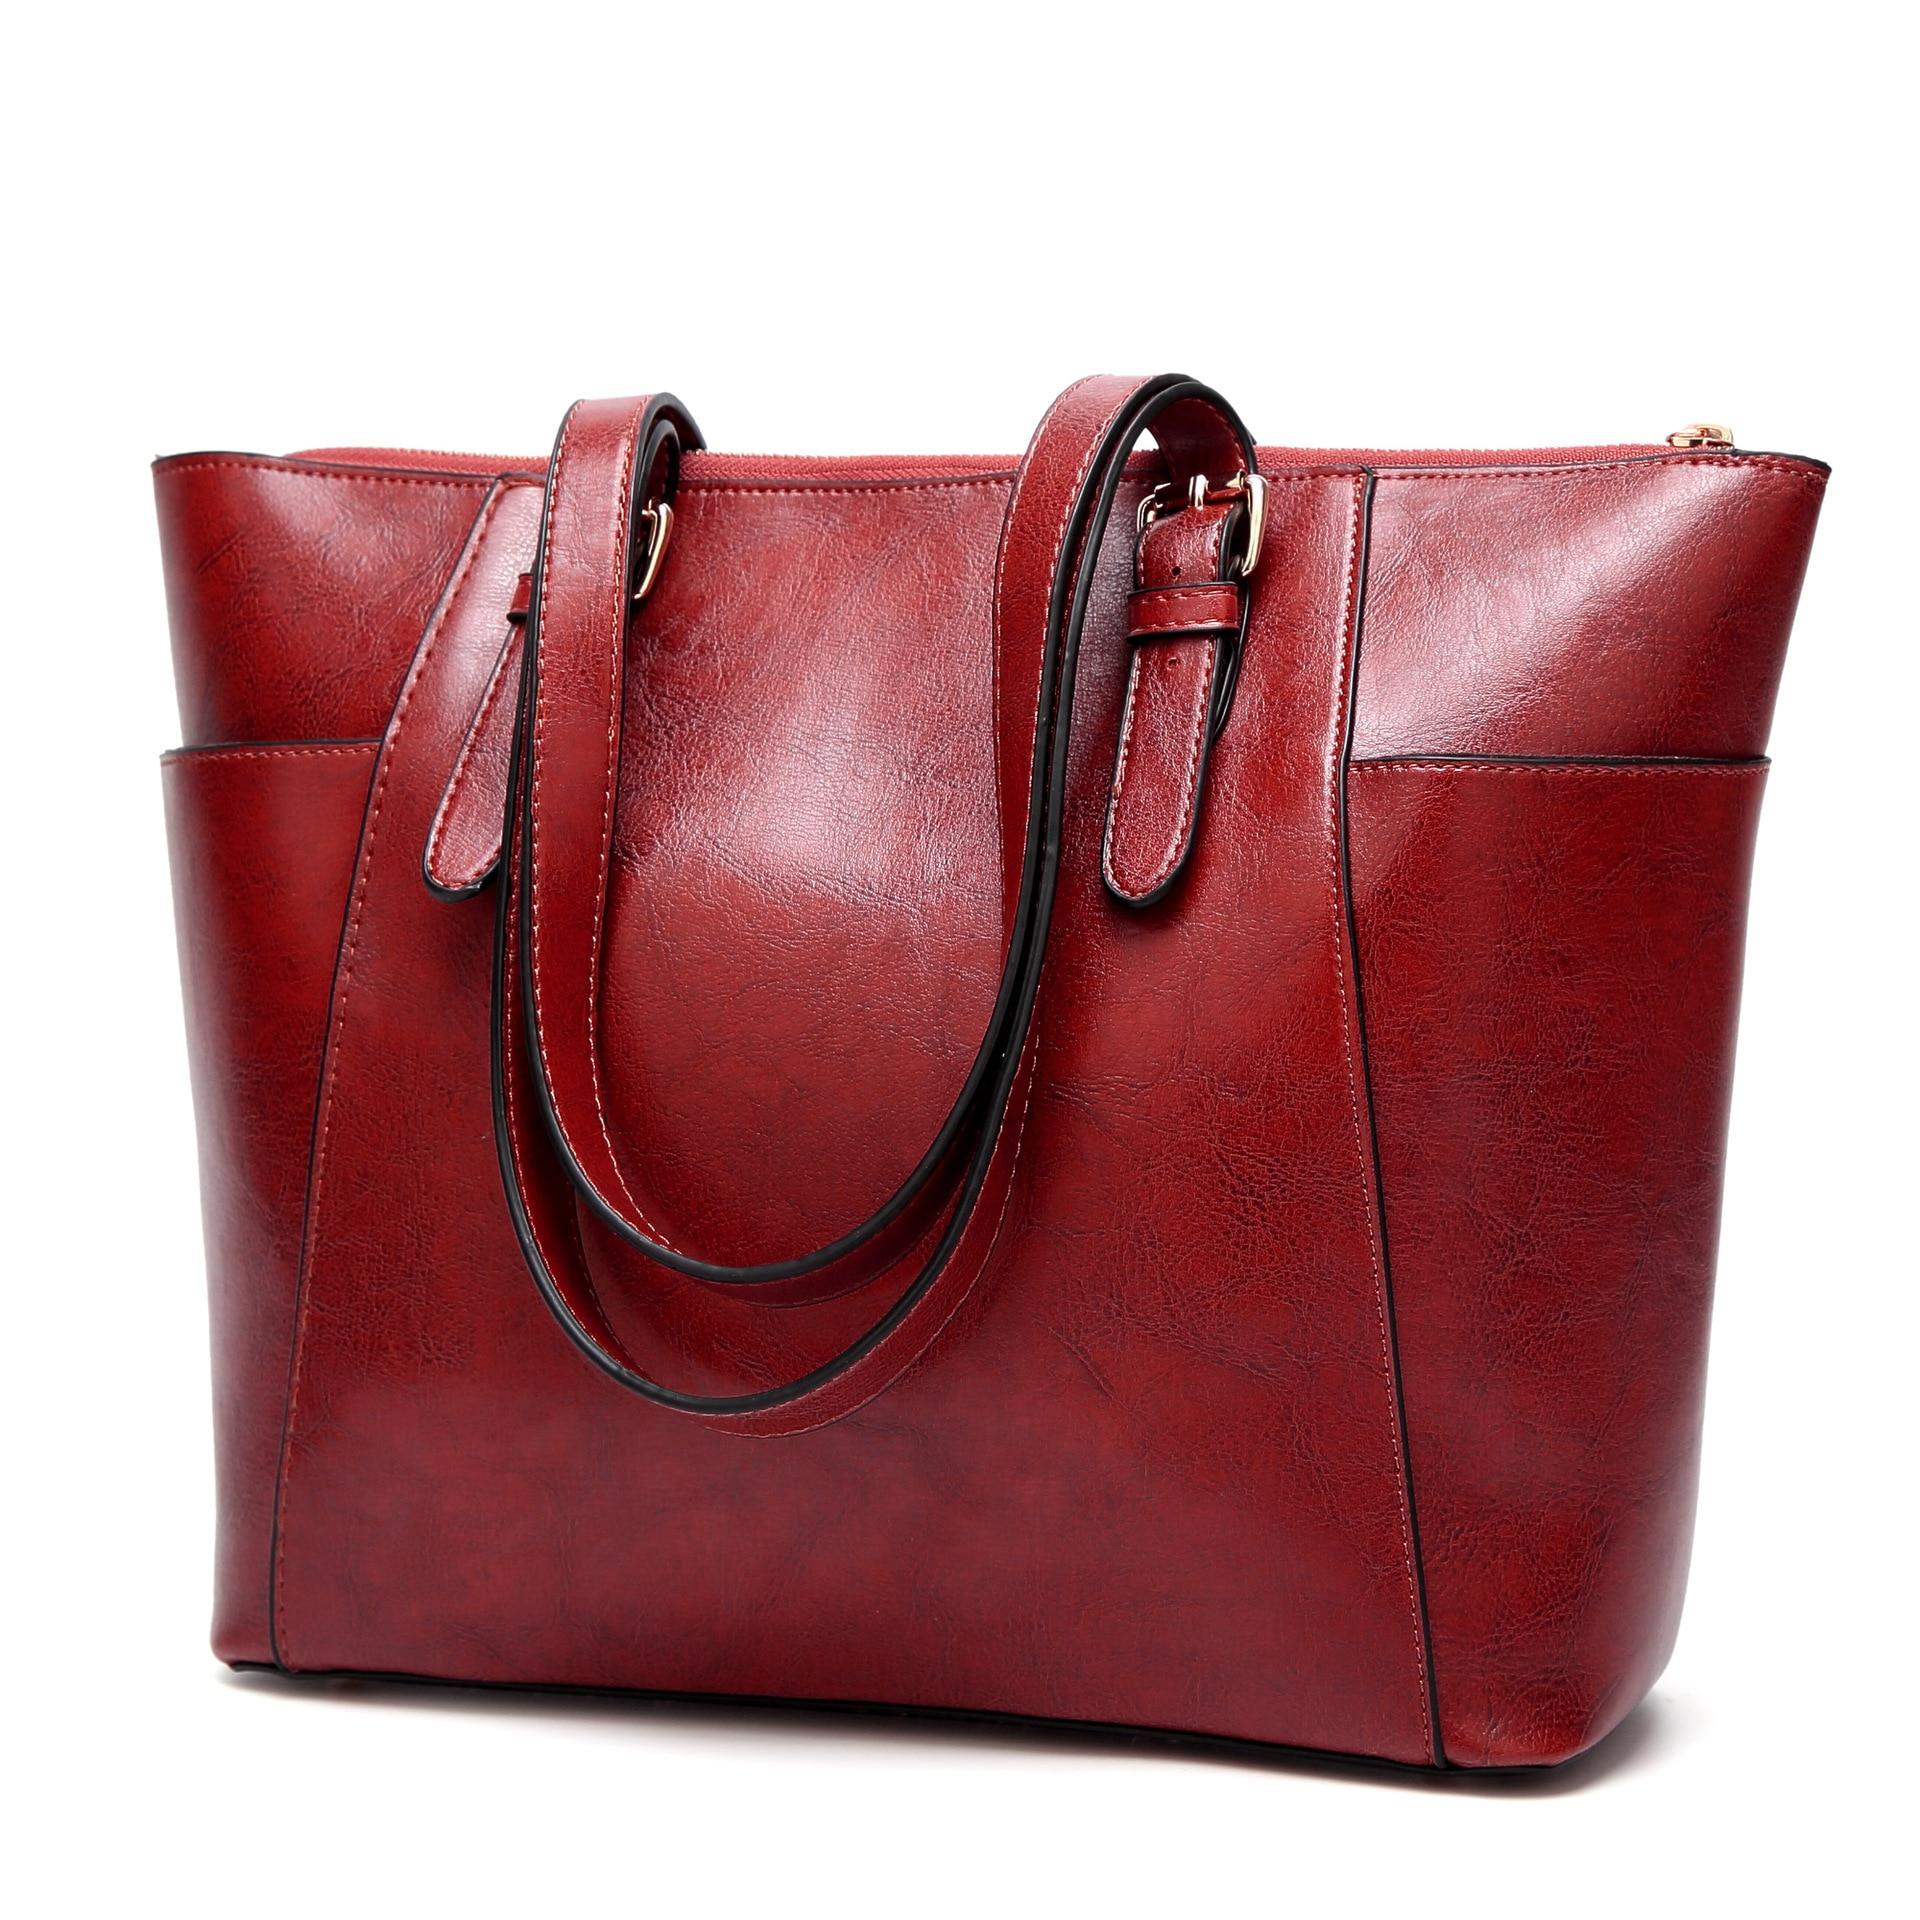 2018 NEW FASHION WOMEN'S BAG RETRO EUROPE AND AMERICA SHOULDER MESSENGER BAG FOREIGN TRADE WAX LADIES HANDBAG WALLET PURSE rm 8912 europe and america new fashion ladies bag leather handbag shoulder bags women tassel messenger bag